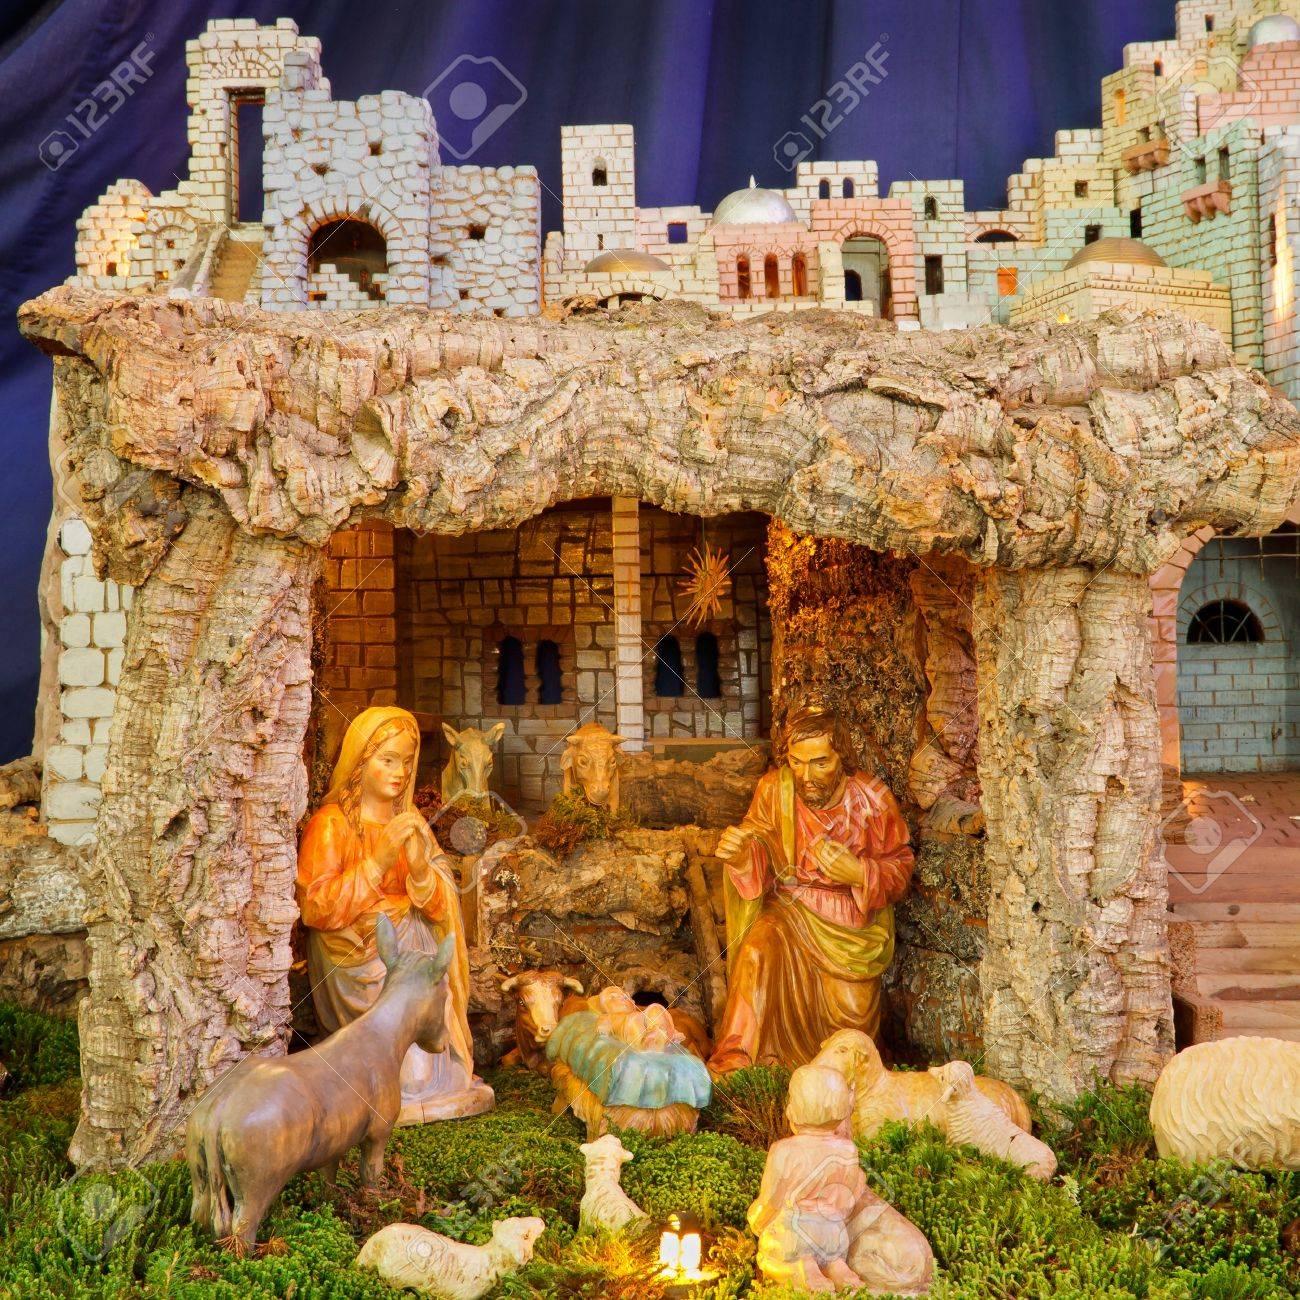 Christmas Nativity Scene Baby Jesus Mary Joseph Stock Photo Picture And Royalty Free Image Image 17274745